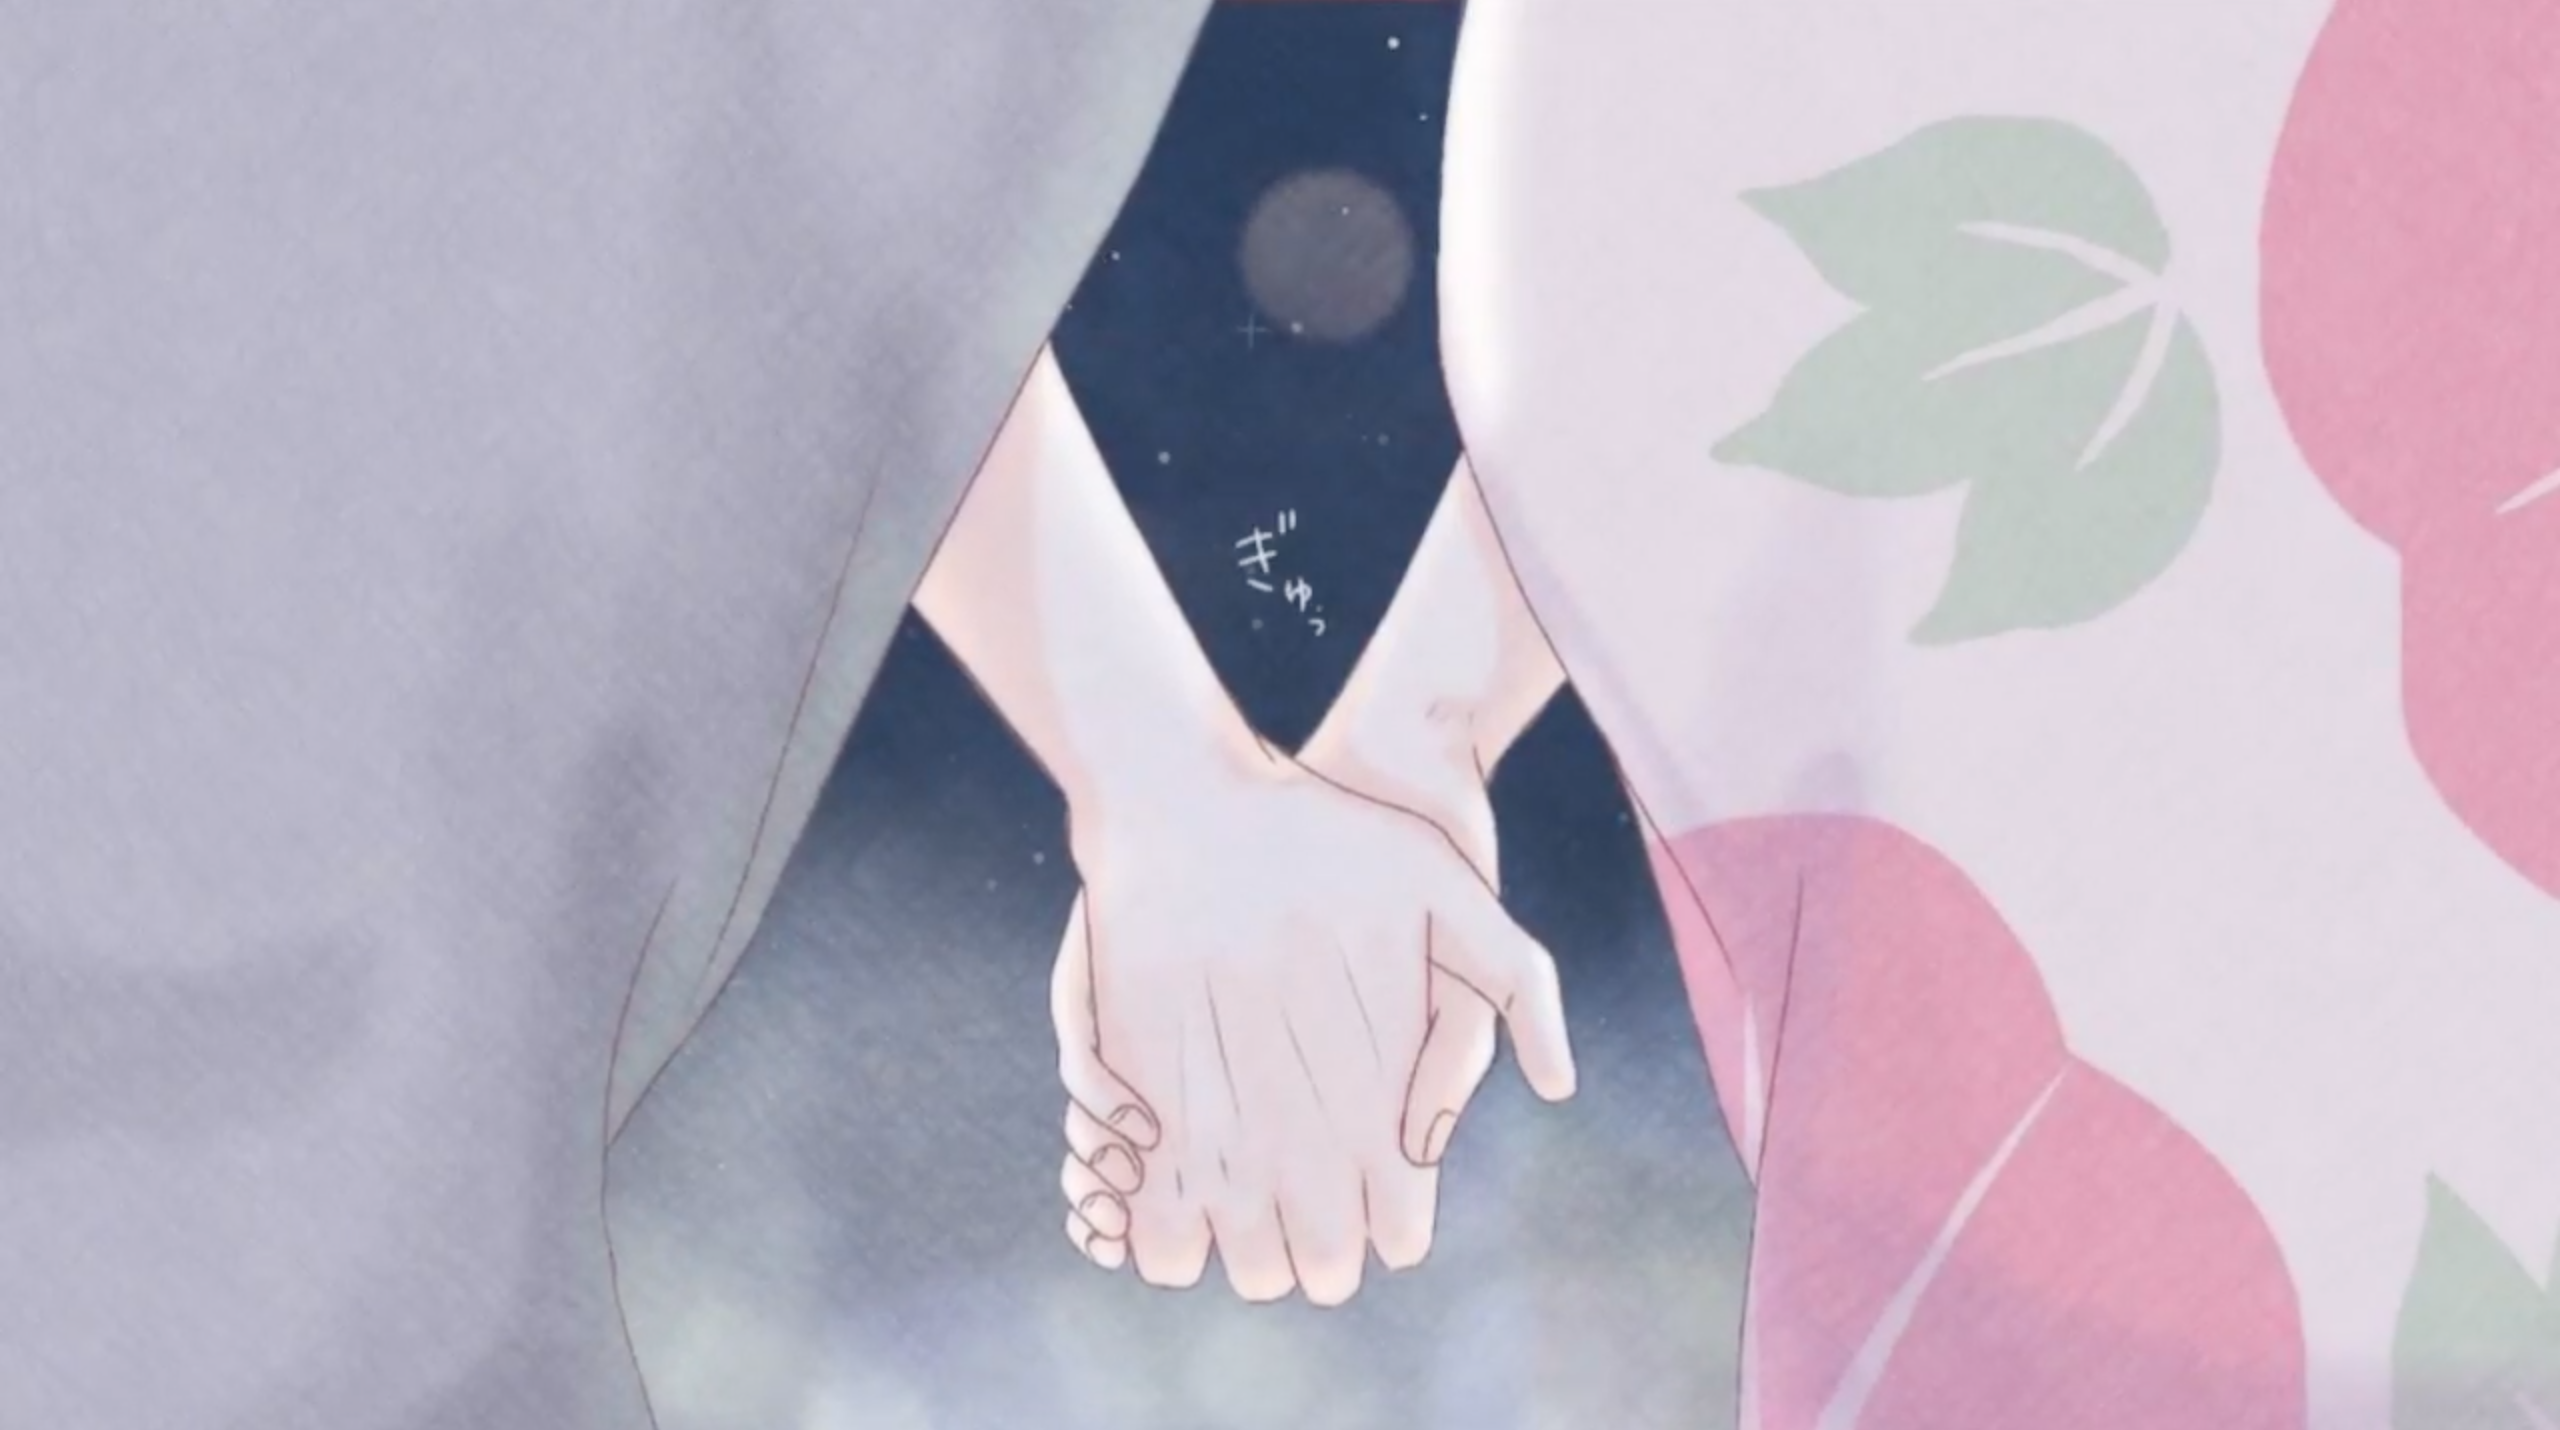 whiteeeen胸きゅんマンガストーリー第3話「バイバイの前に(⑉• •⑉)」